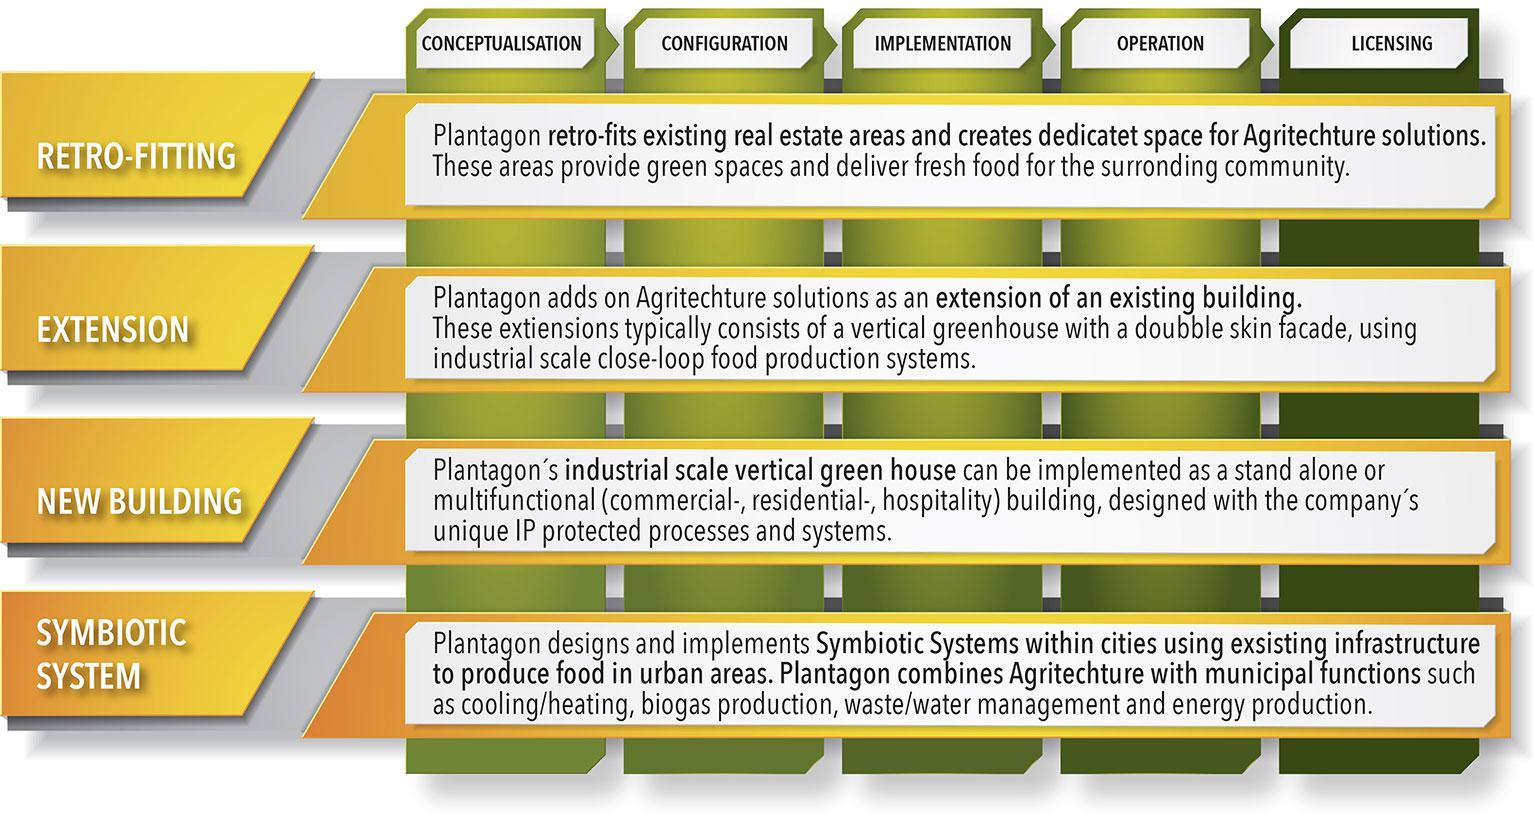 Business Model - Plantagon